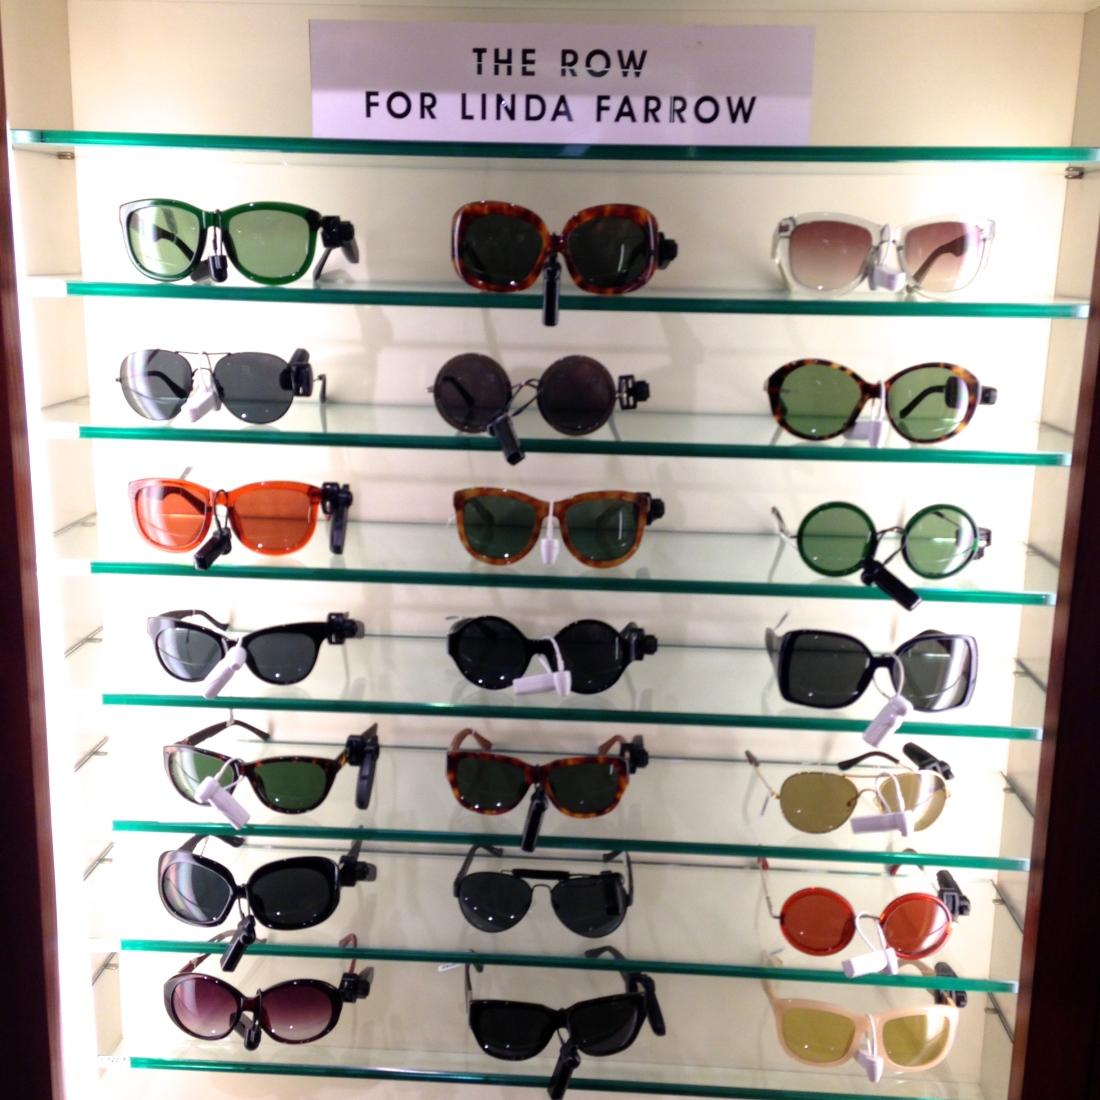 Liberty, London, Sunglasses from The Row (Linda Farrow)